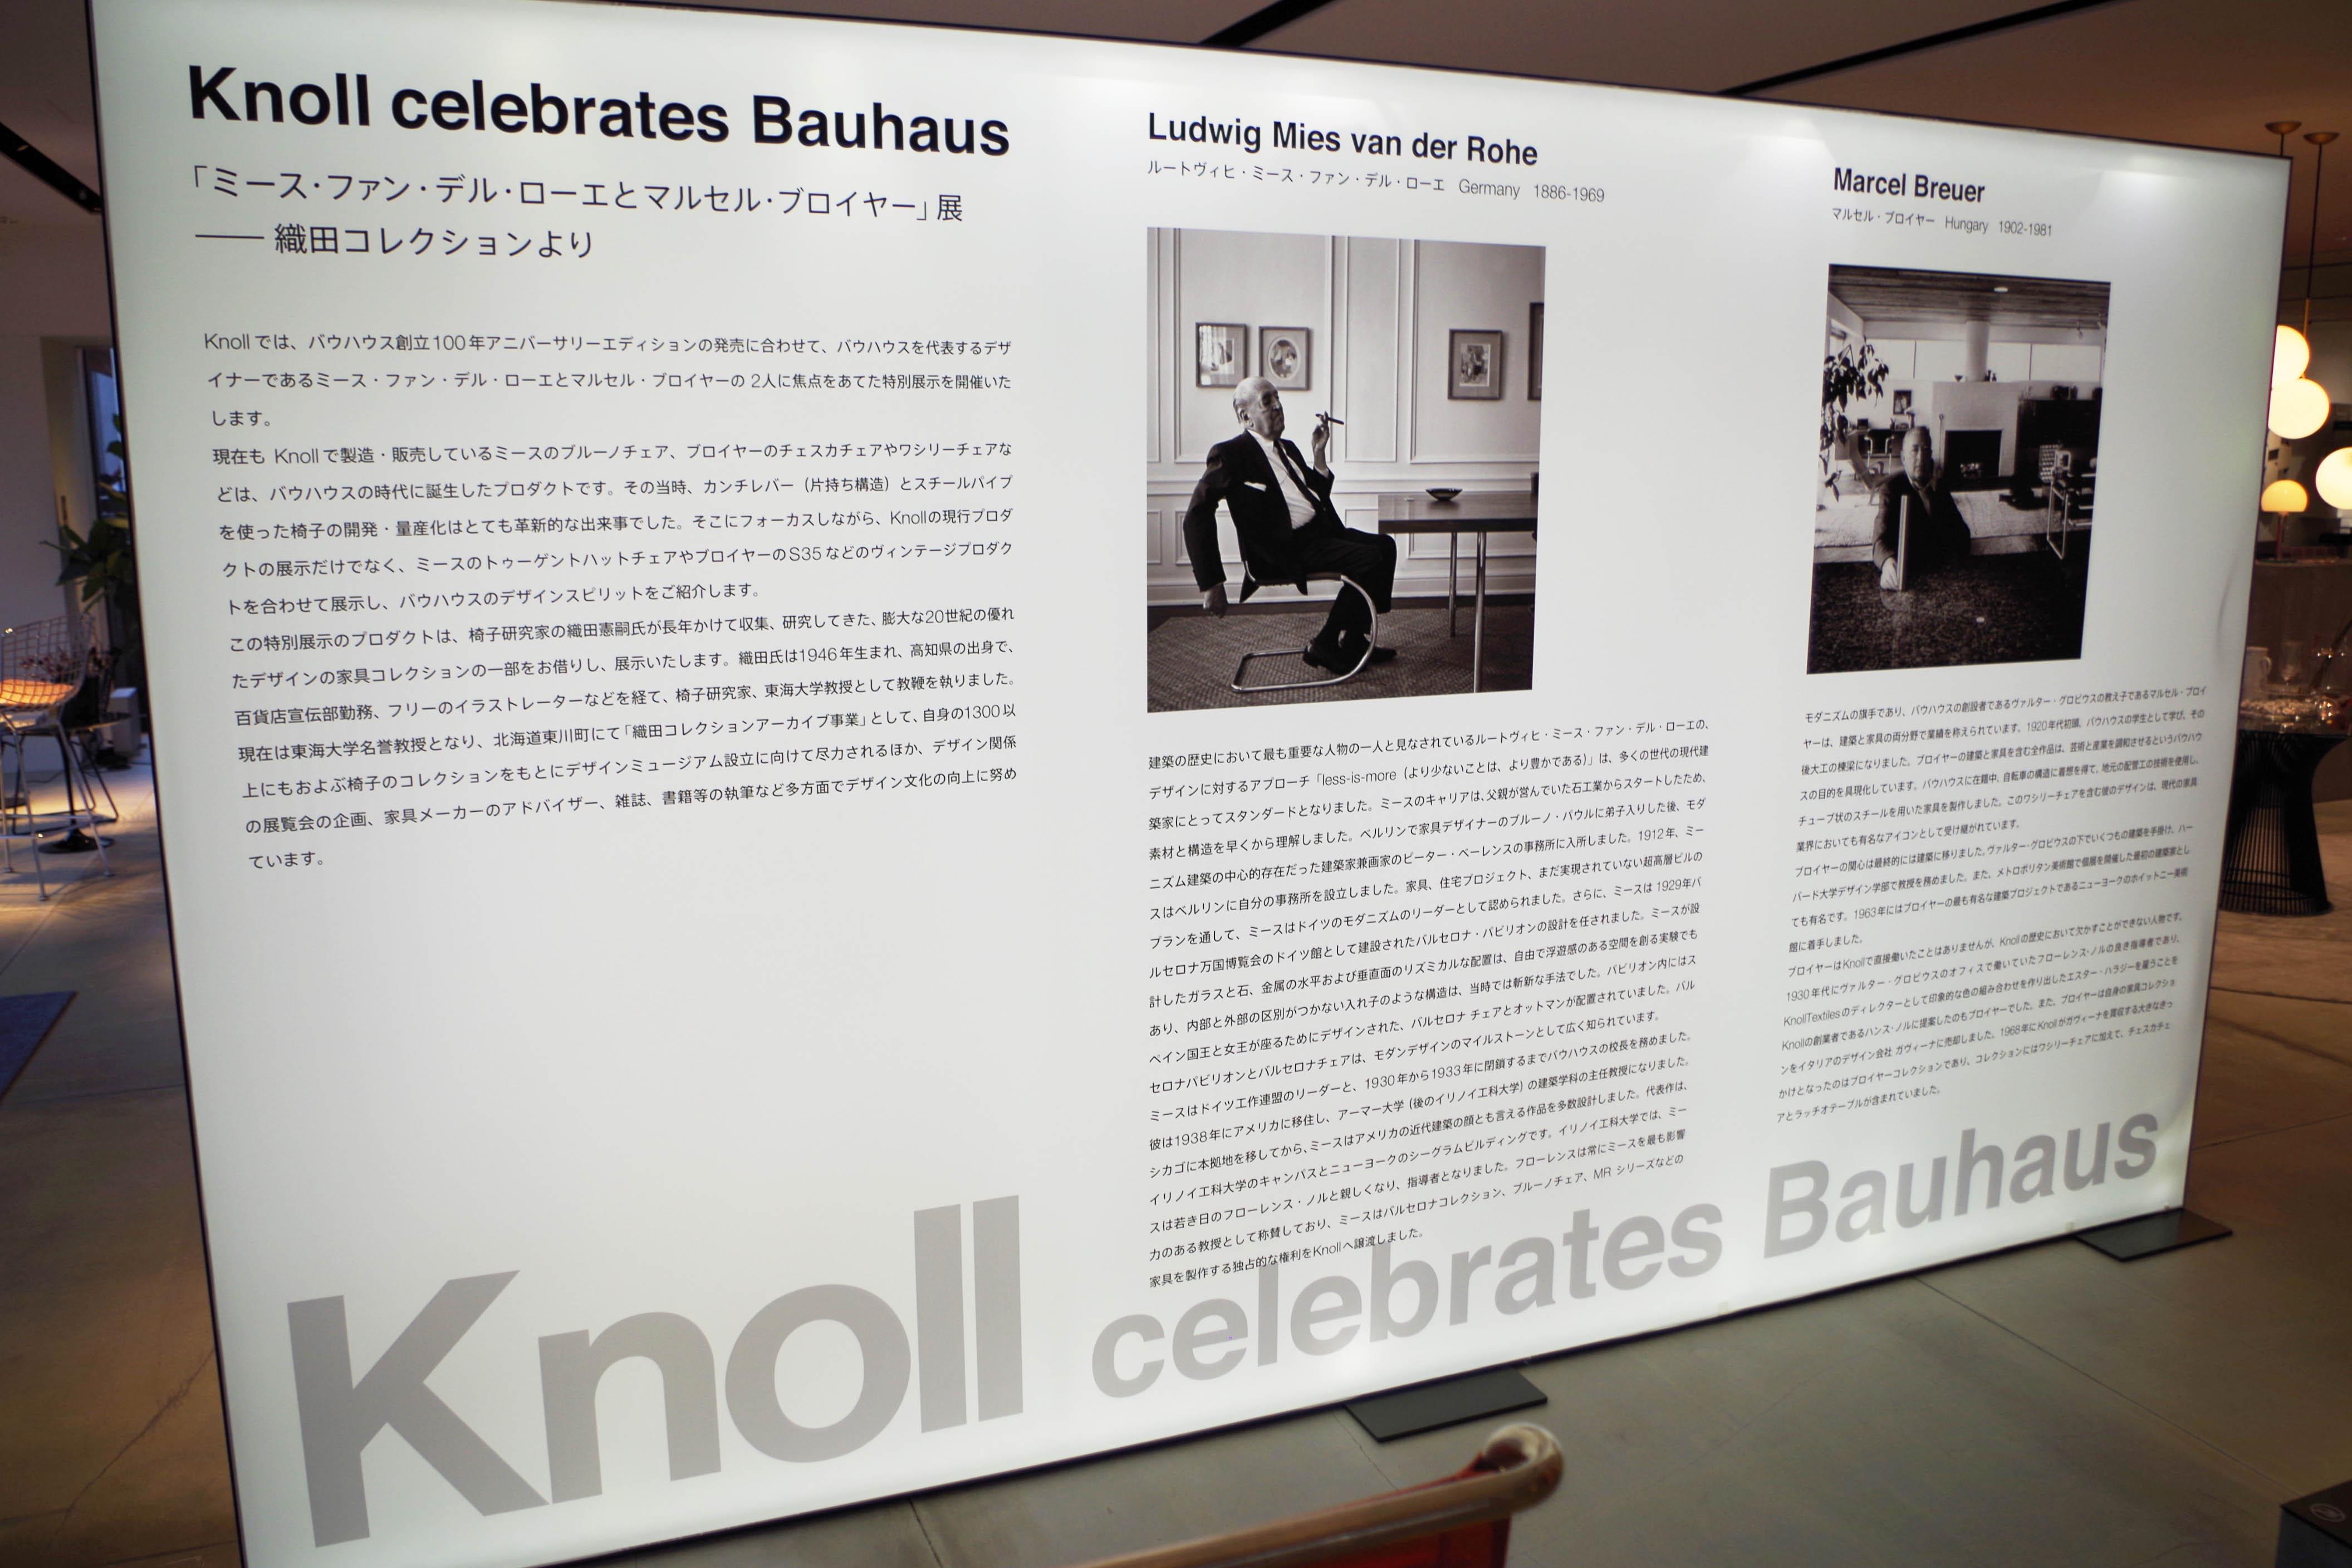 Knoll celebrates Bauhaus説明文